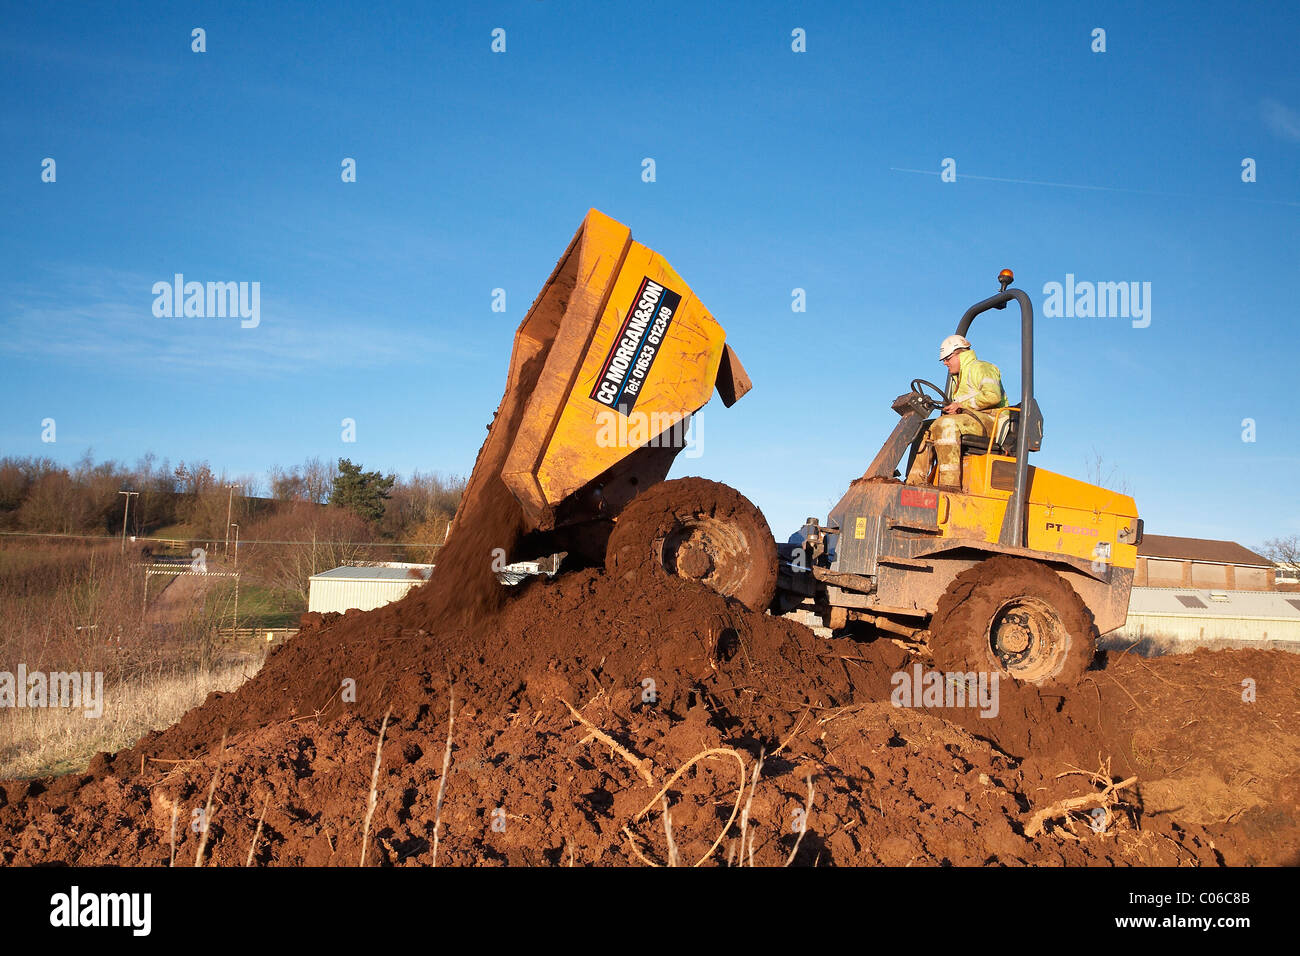 Dump truck emptying its bucket full of earth - Stock Image